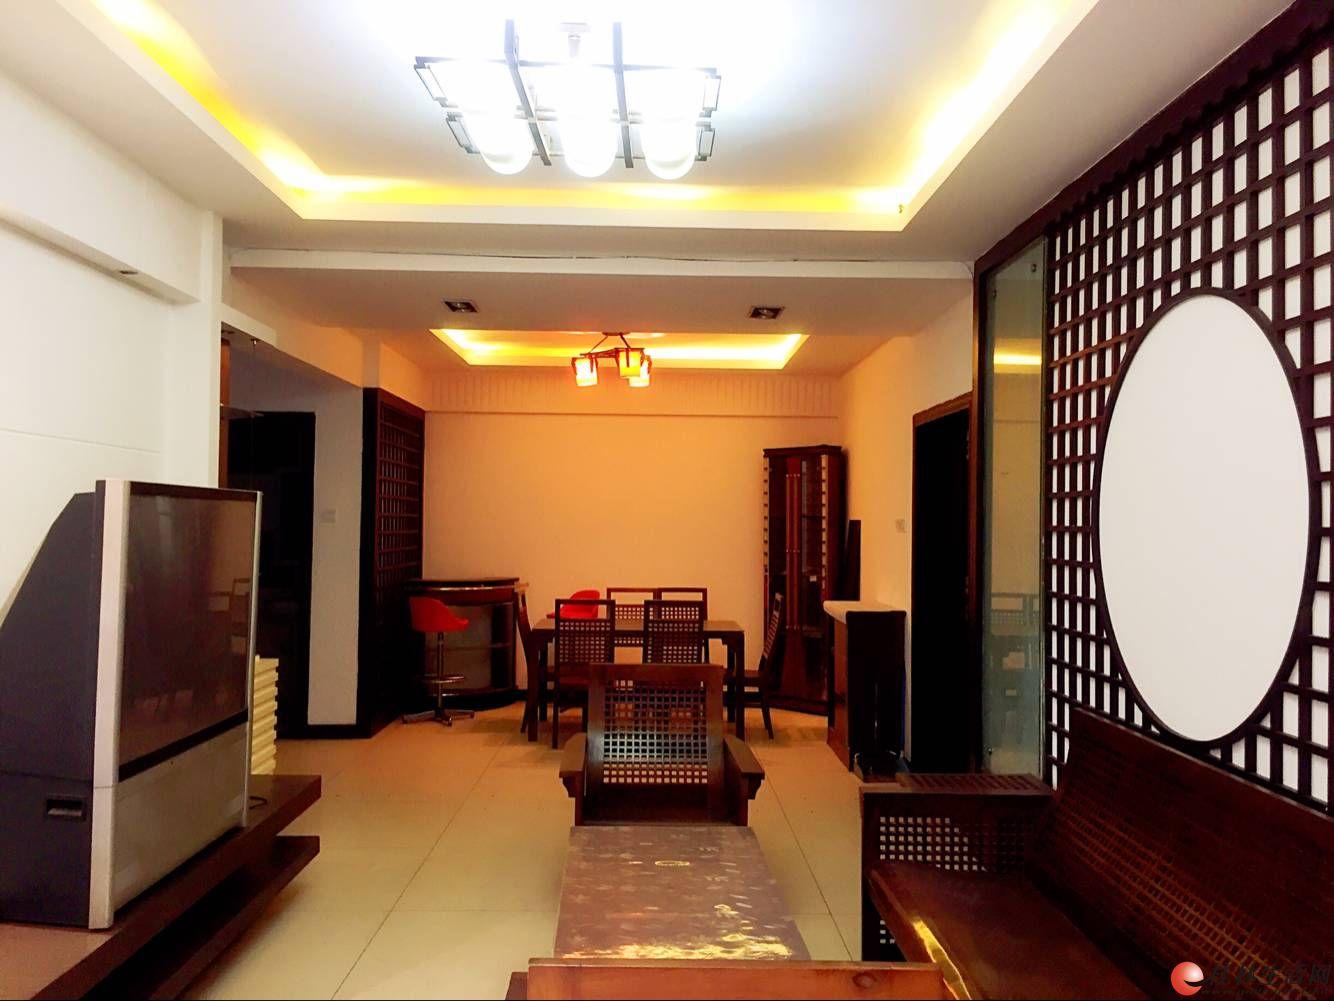 W(出售)  罗马花园3房132㎡80万 精装修 送家具电  优质大3房户型 看房方便